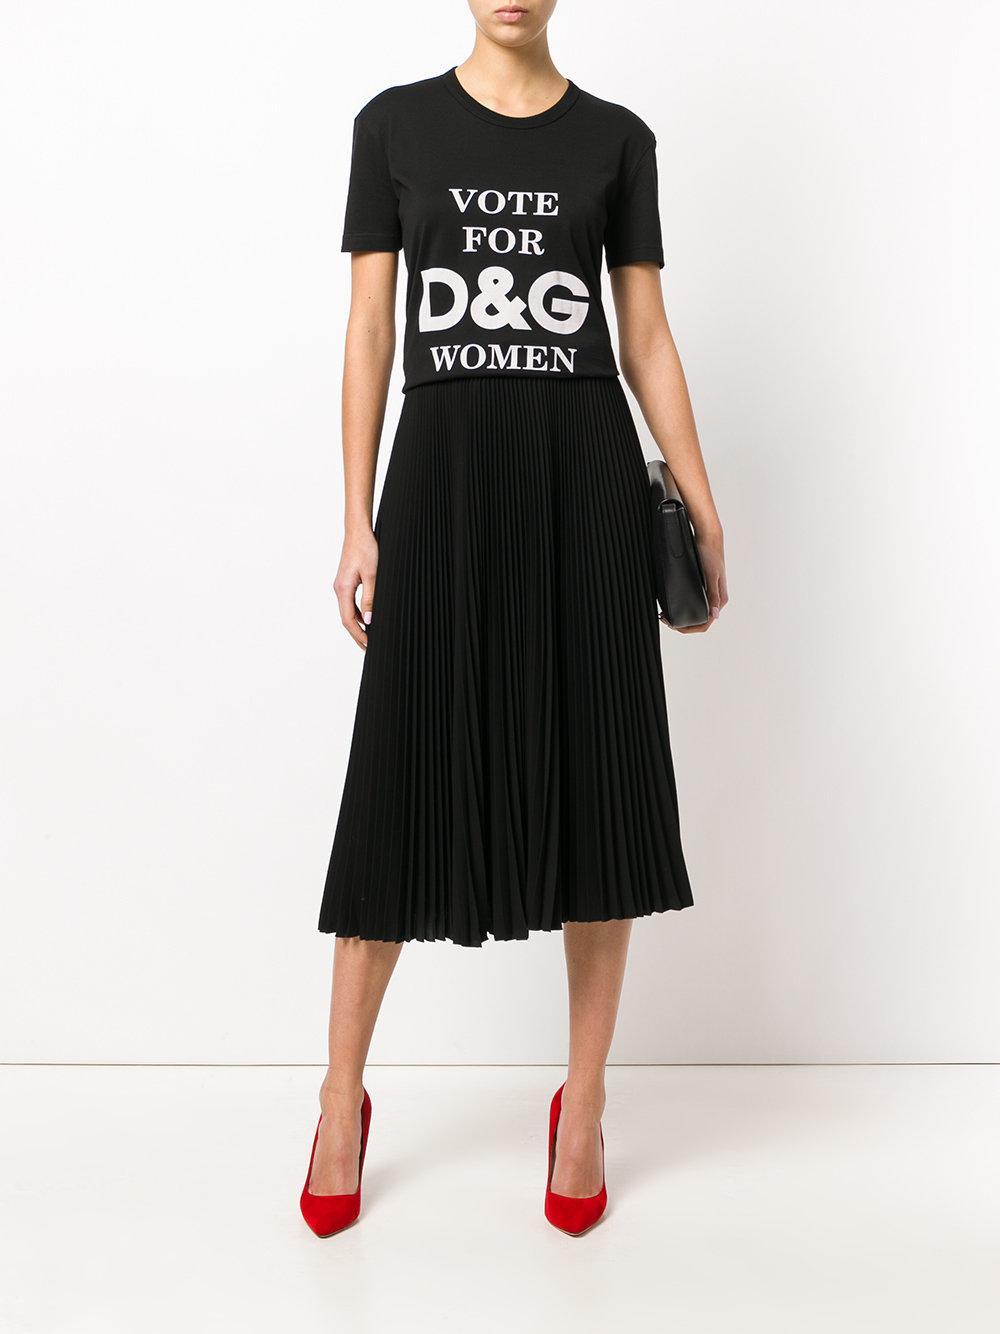 f1ca8359 Dolce & Gabbana Vote For Dg Women T-shirt in Black - Lyst